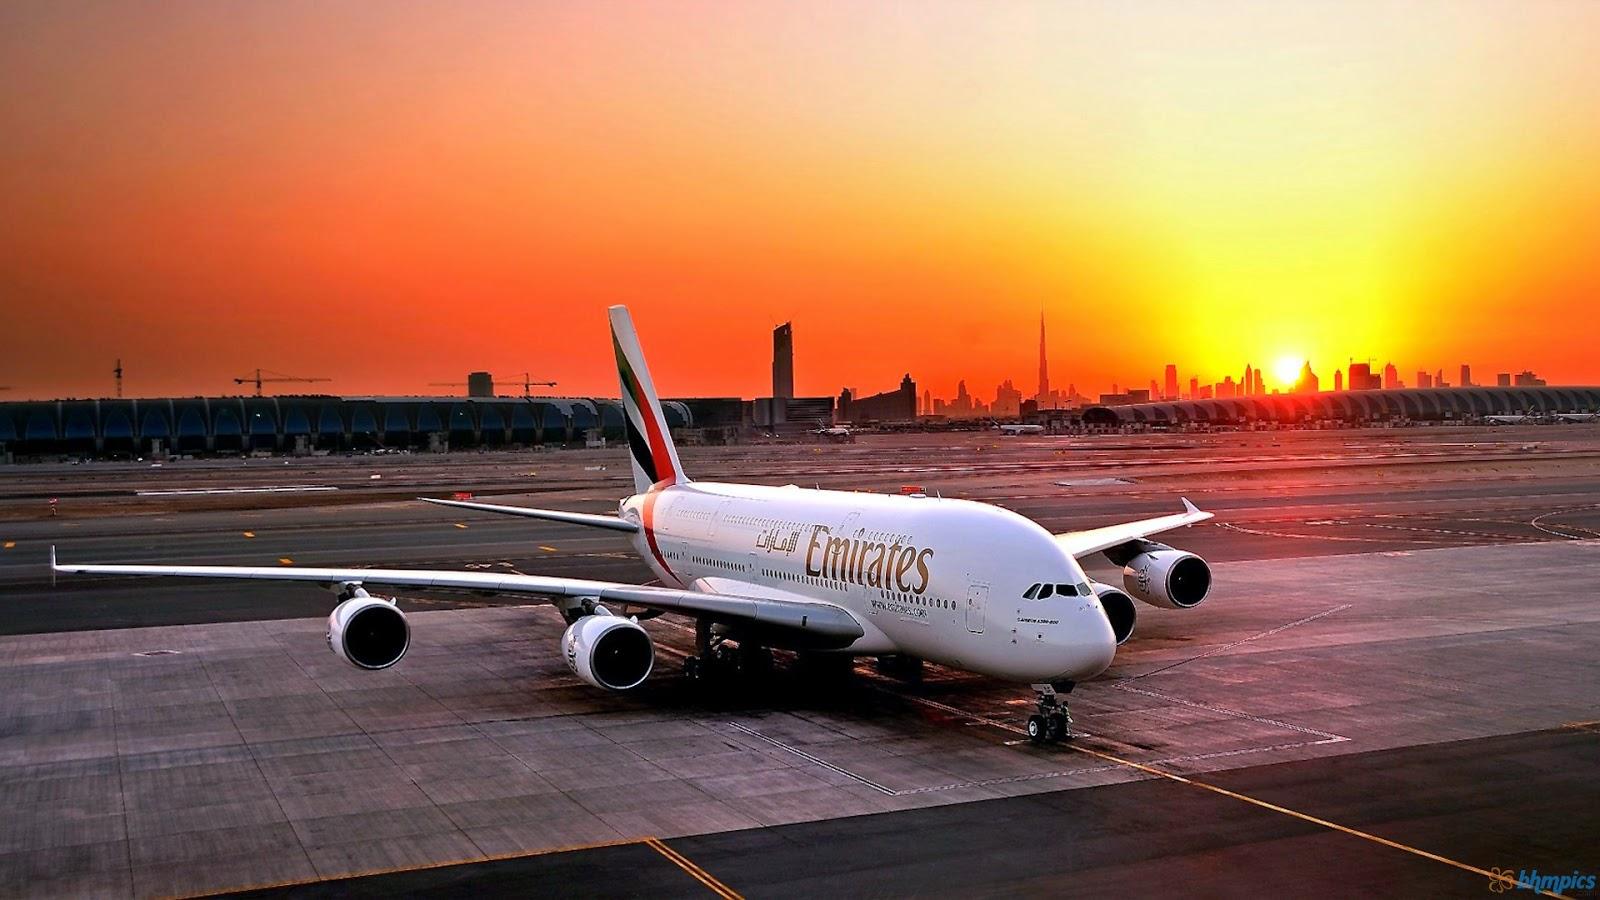 emirates-airplane-sunset-dubai